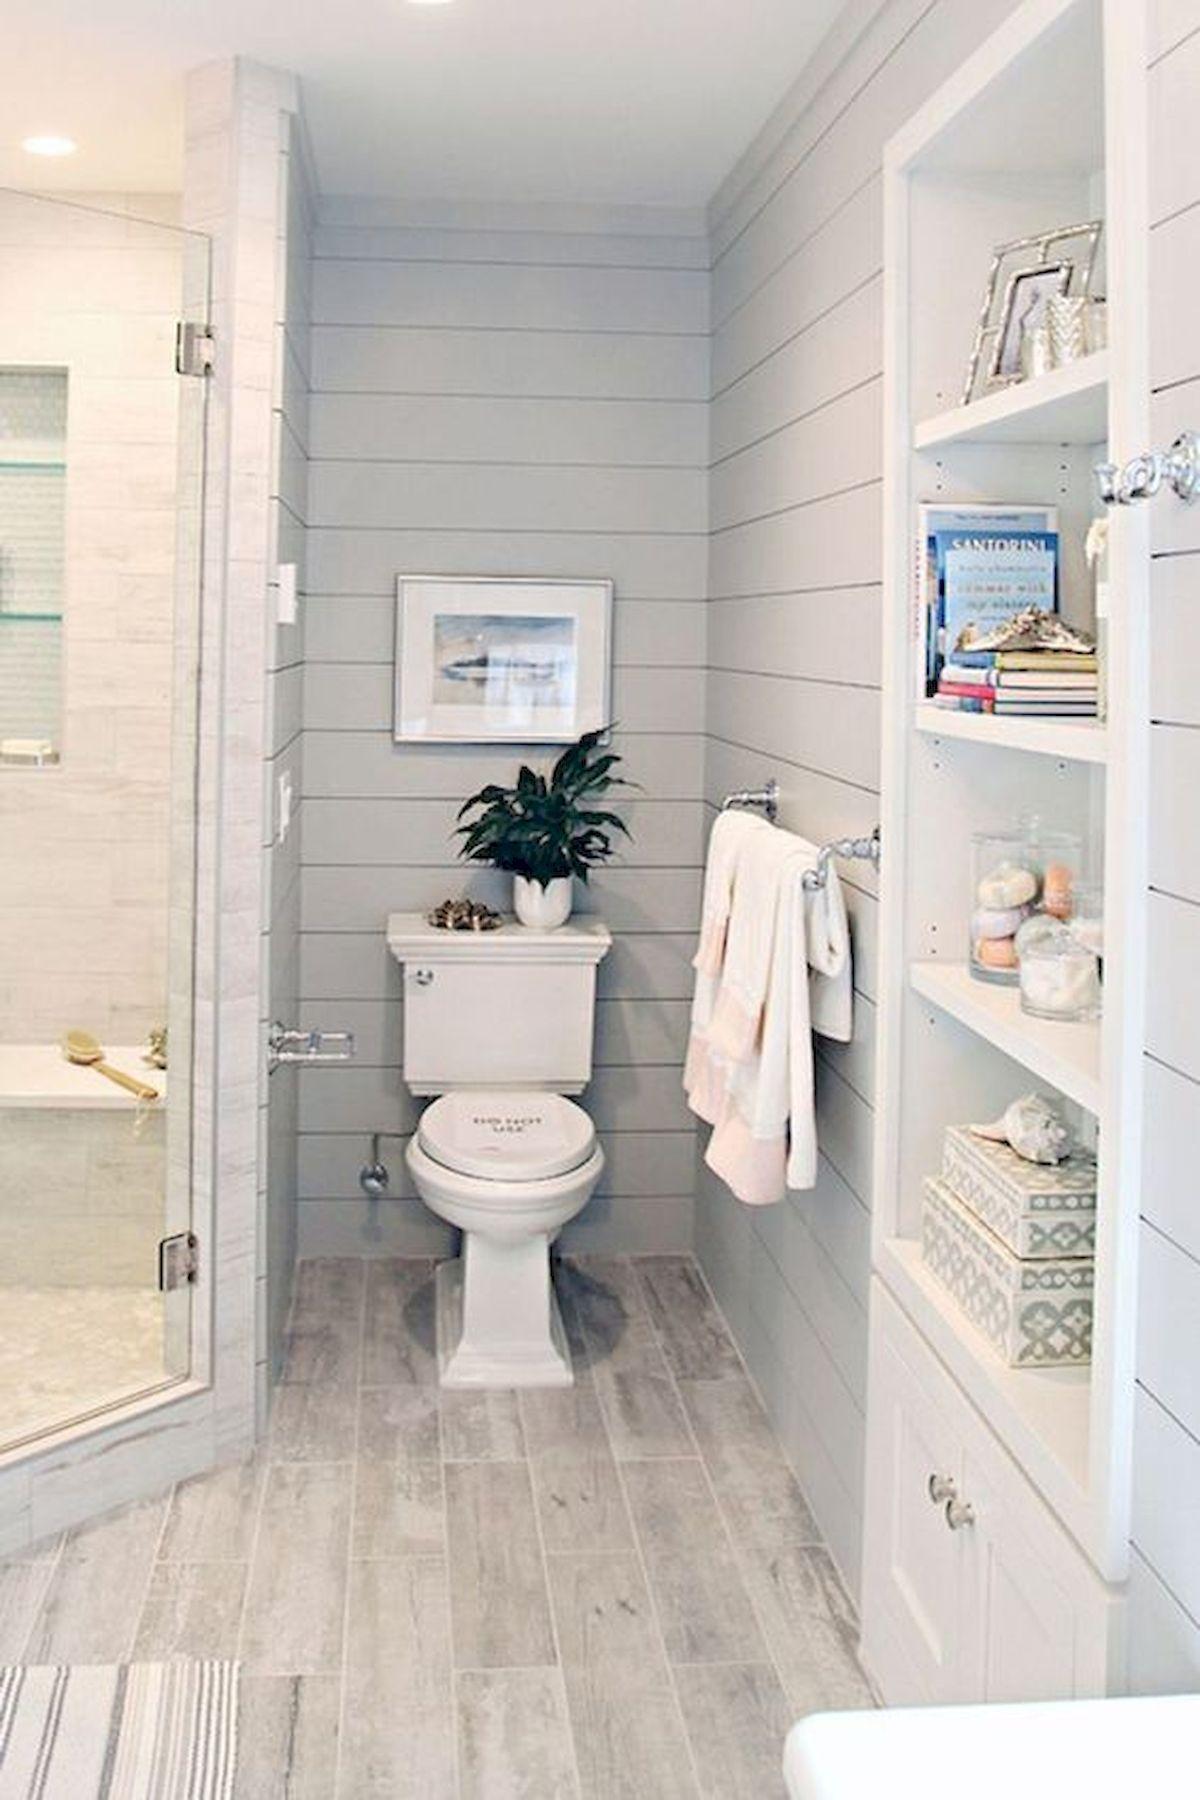 60 Elegant Small Master Bathroom Remodel Ideas 54 In 2019